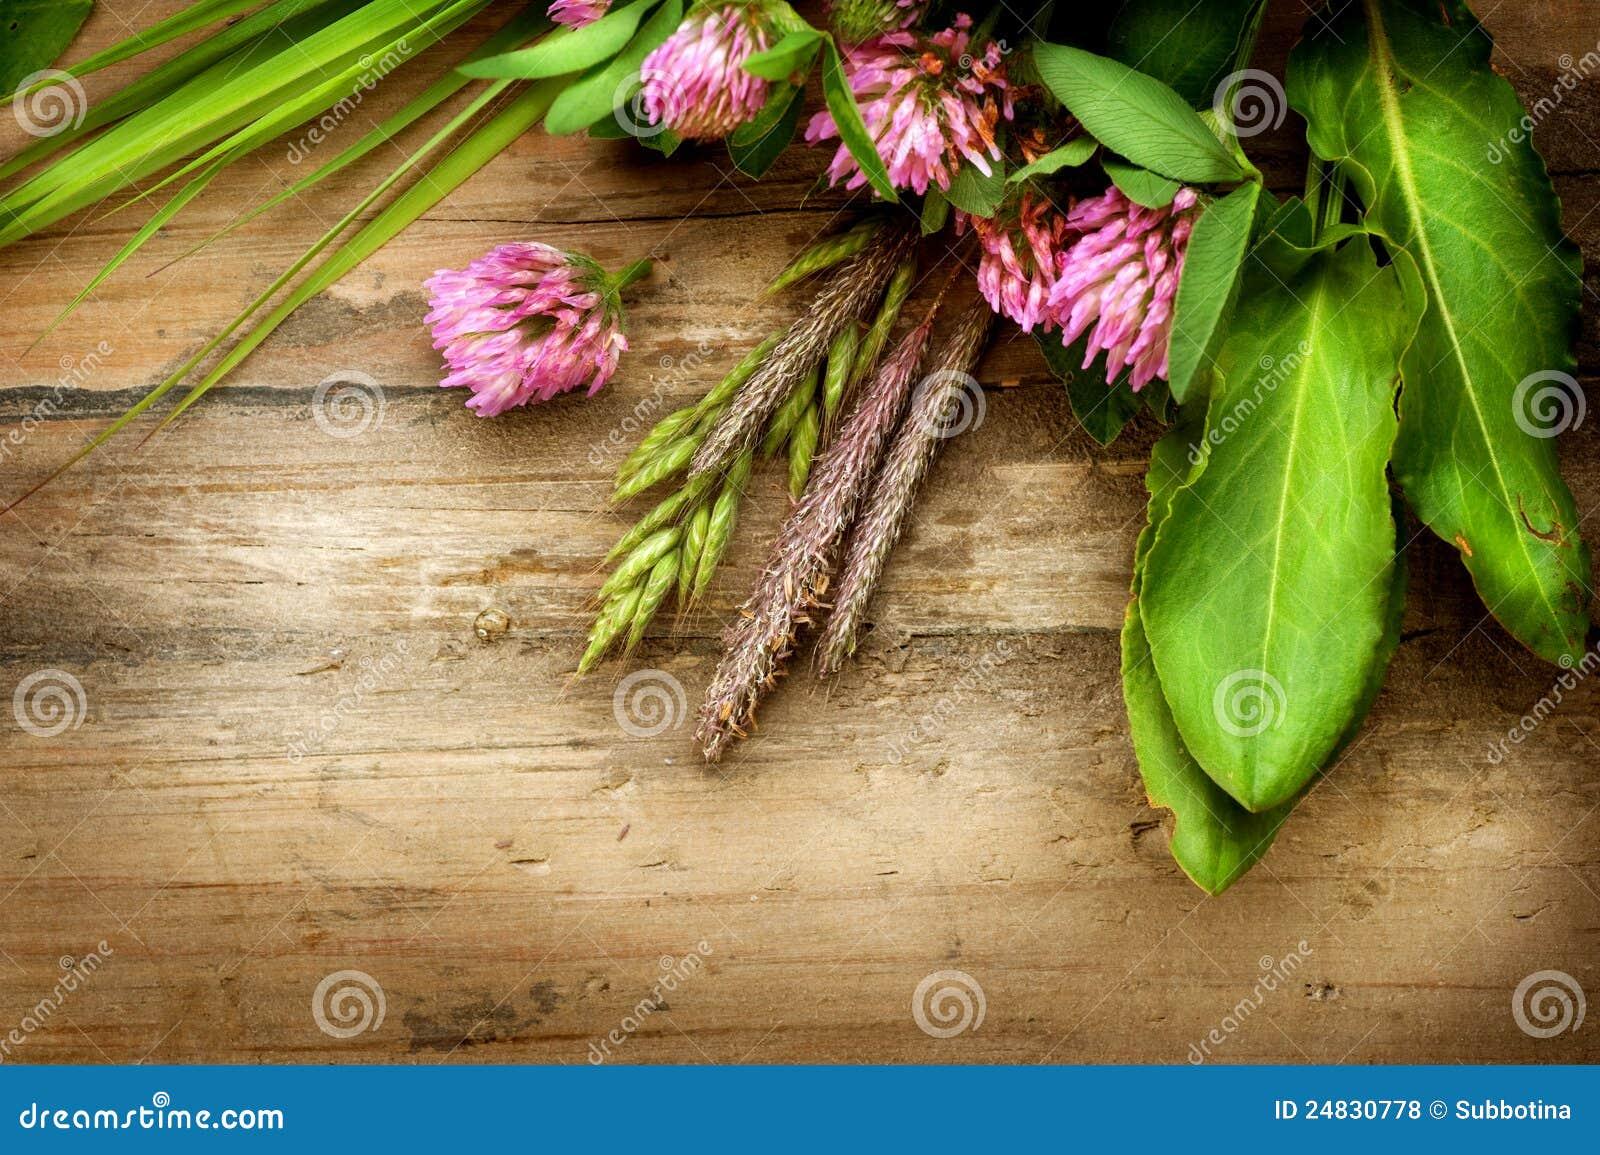 Herbs over Wood